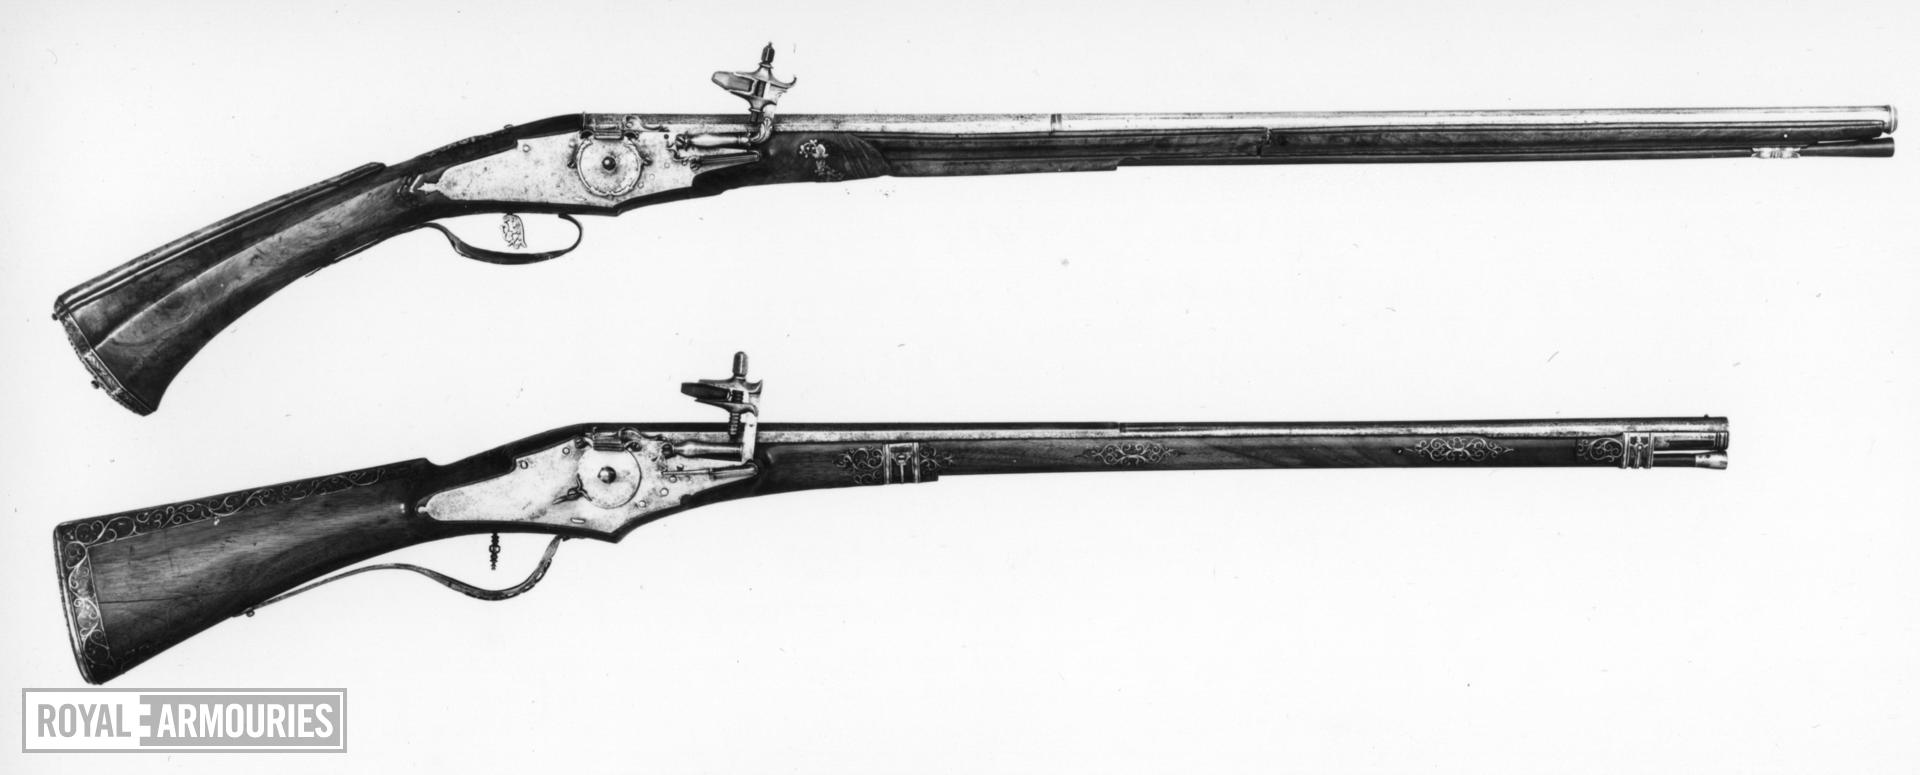 Wheellock muzzle-loading carbine - N/A